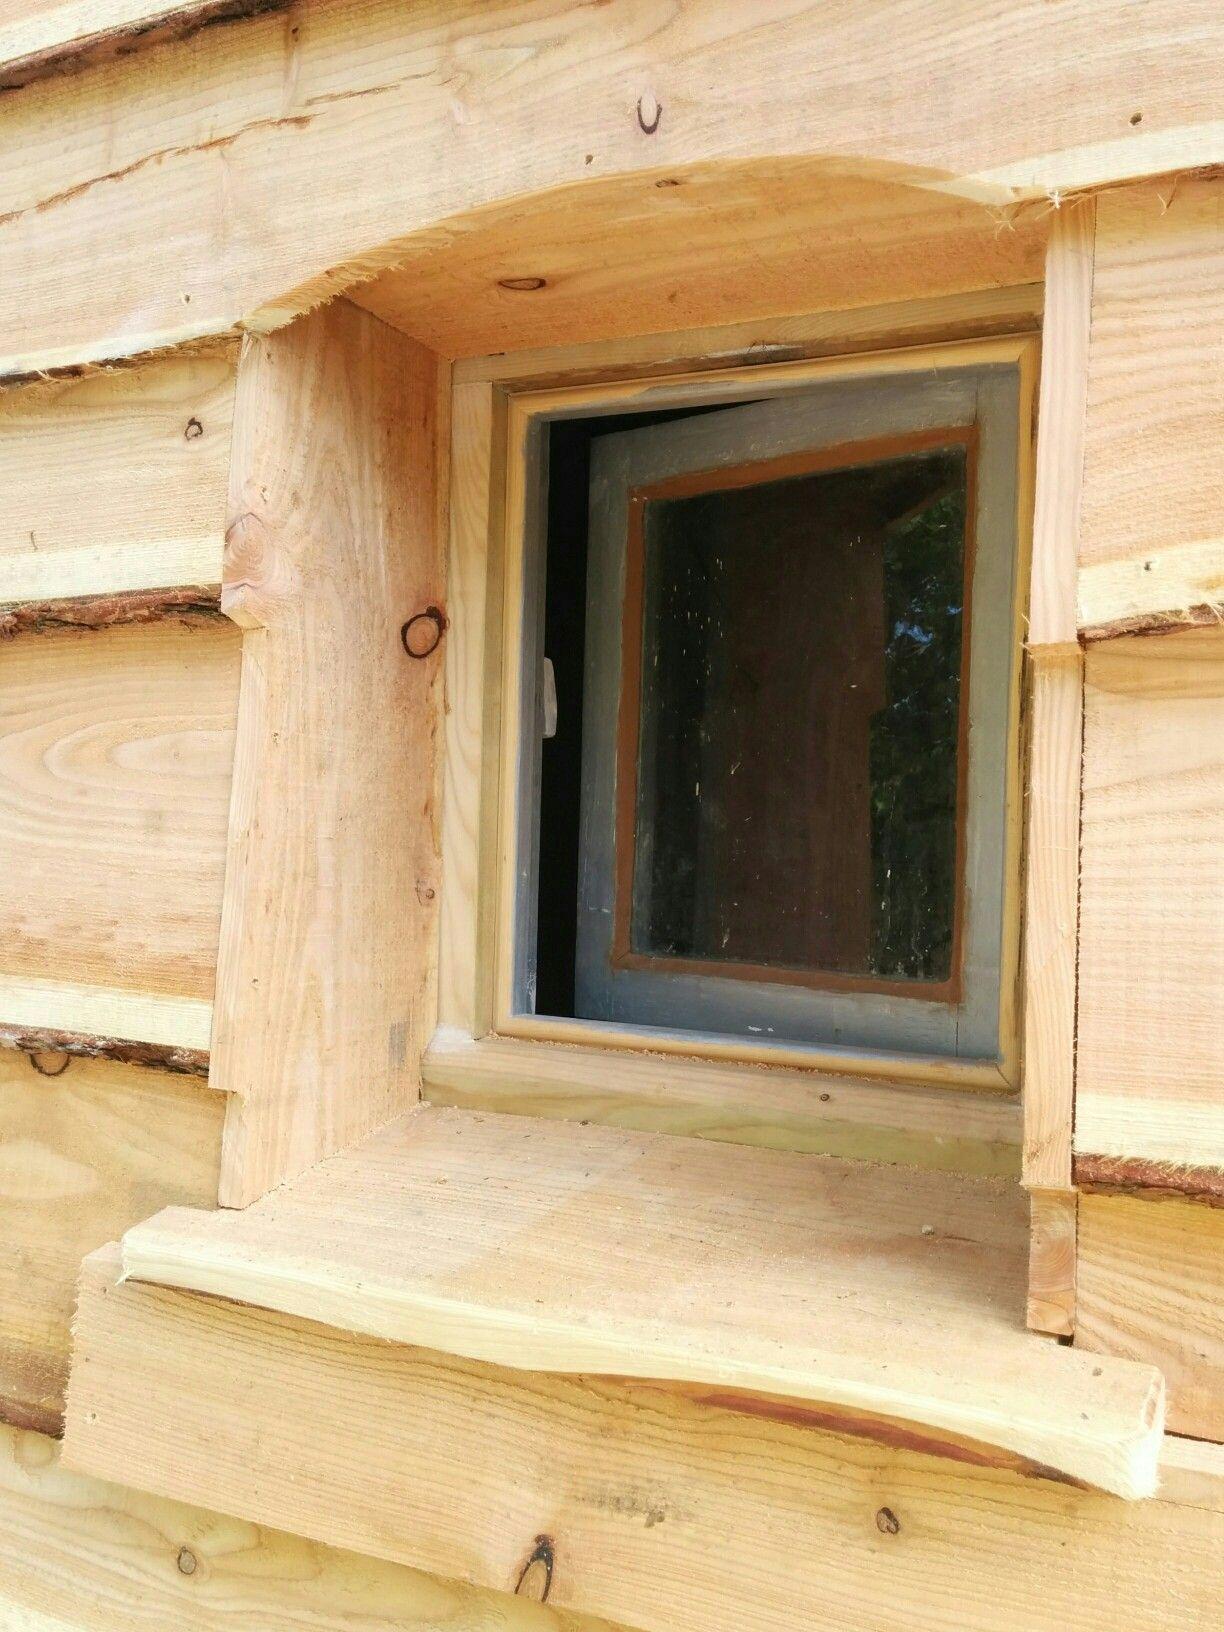 Wany edge ceder cladding window reveal detail | carpentry | Pinterest